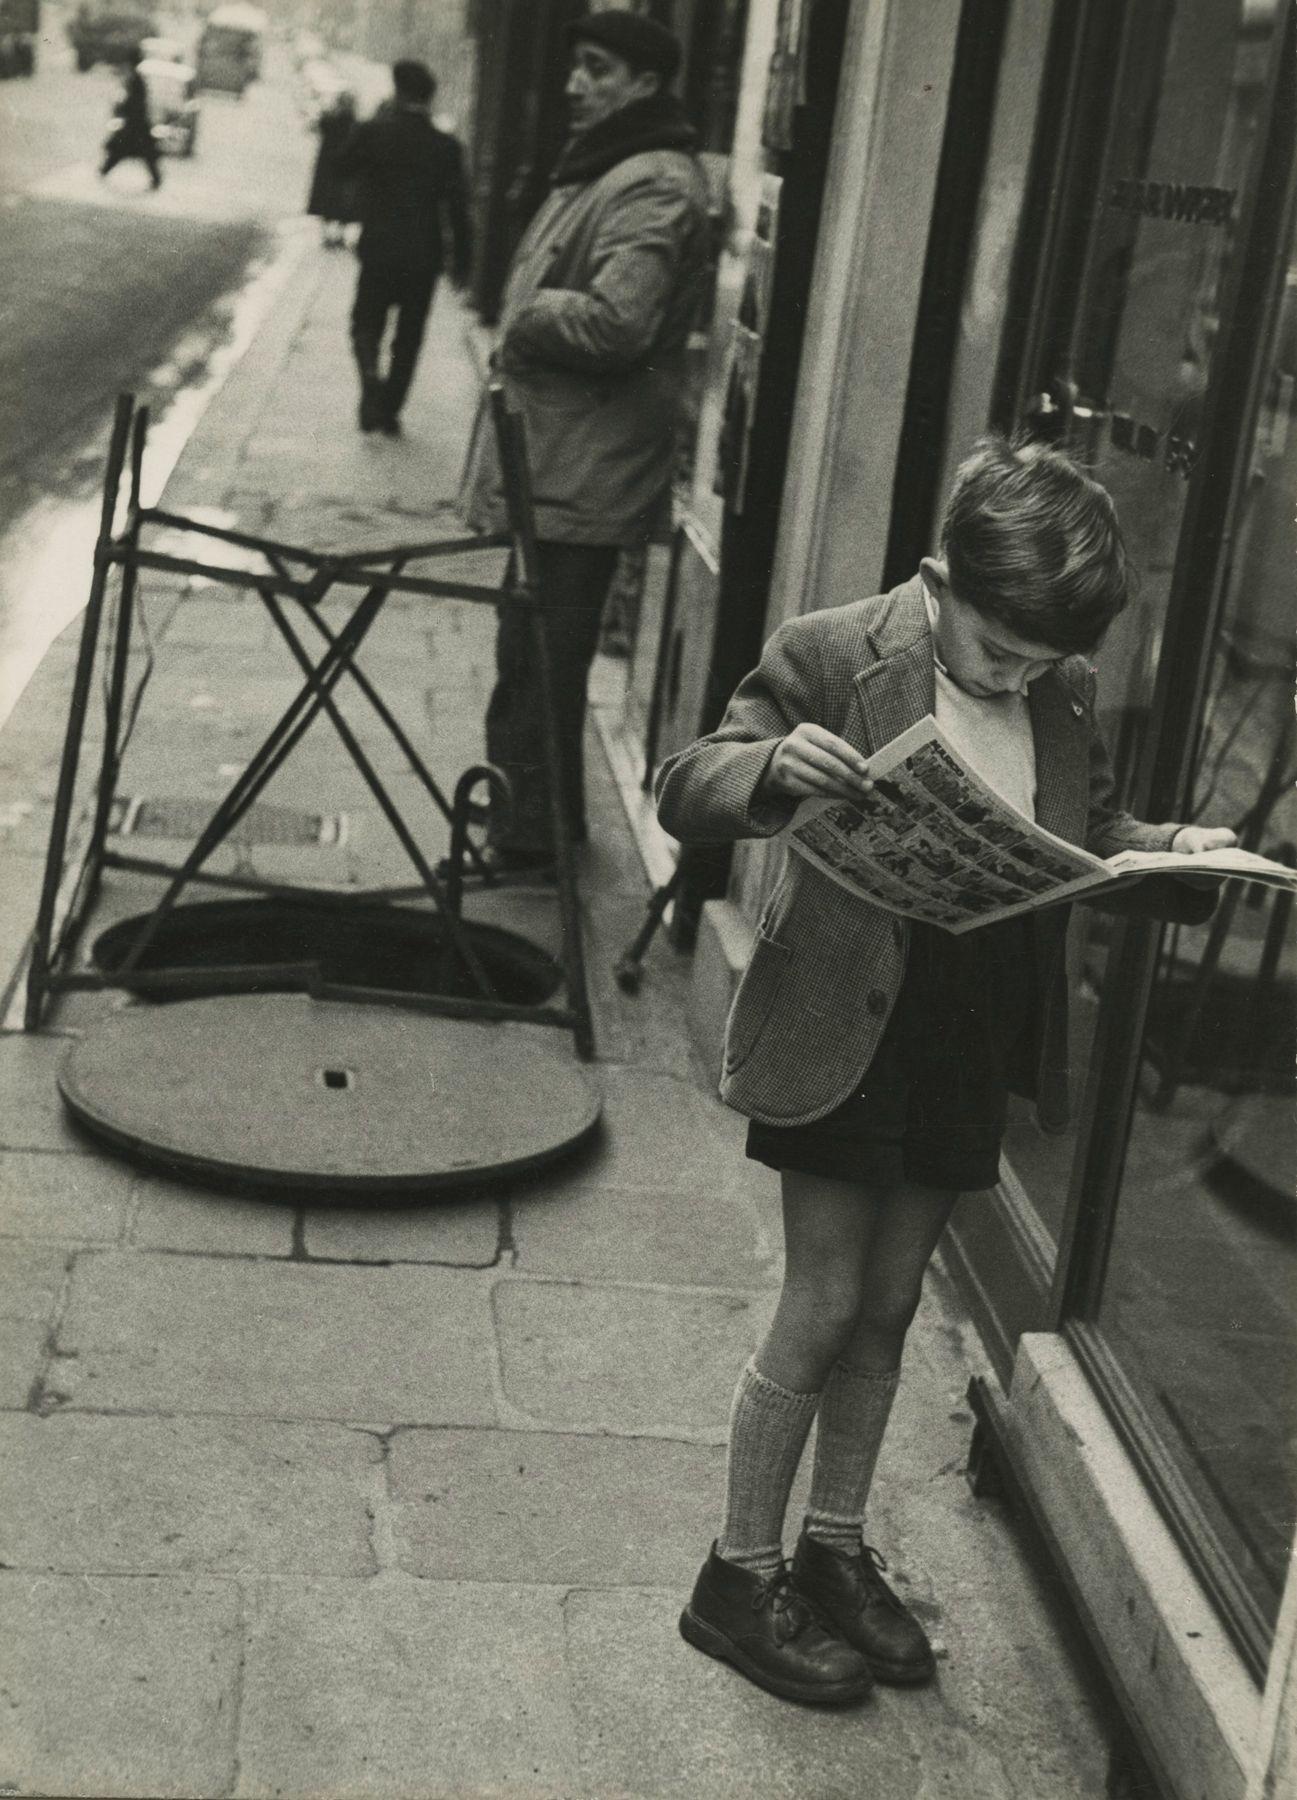 Louis Stettner - Boy Reading Comics, Paris, 1952 - Howard Greenberg Gallery